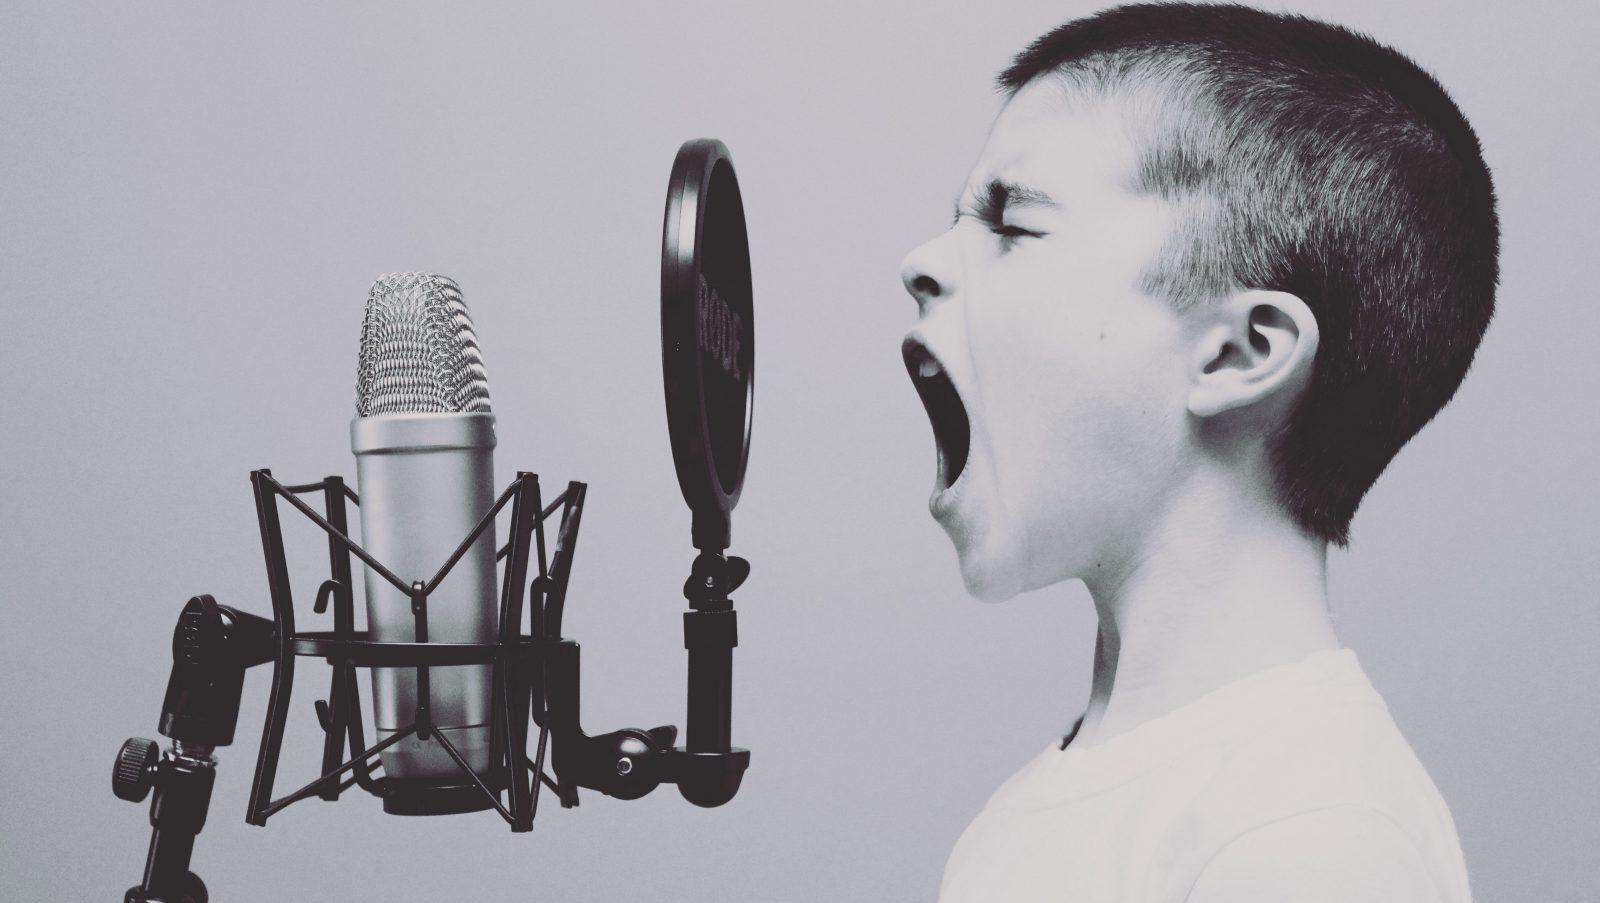 Kid screams into microphone